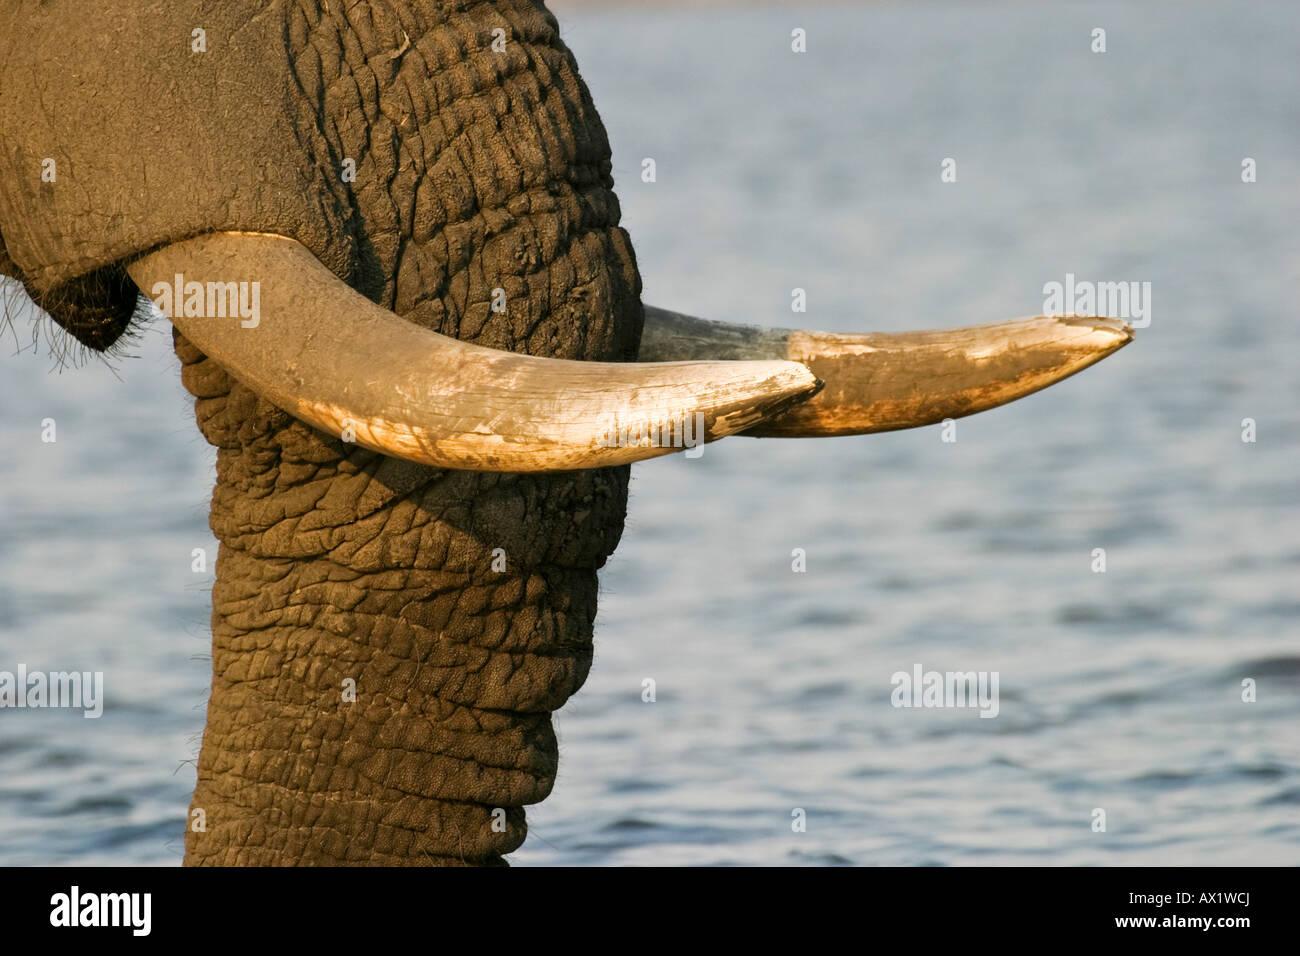 Rostrum and tusks, african elephant (Loxodonta africana) at the Chobe River, Chobe National Park, Botswana, Africa - Stock Image